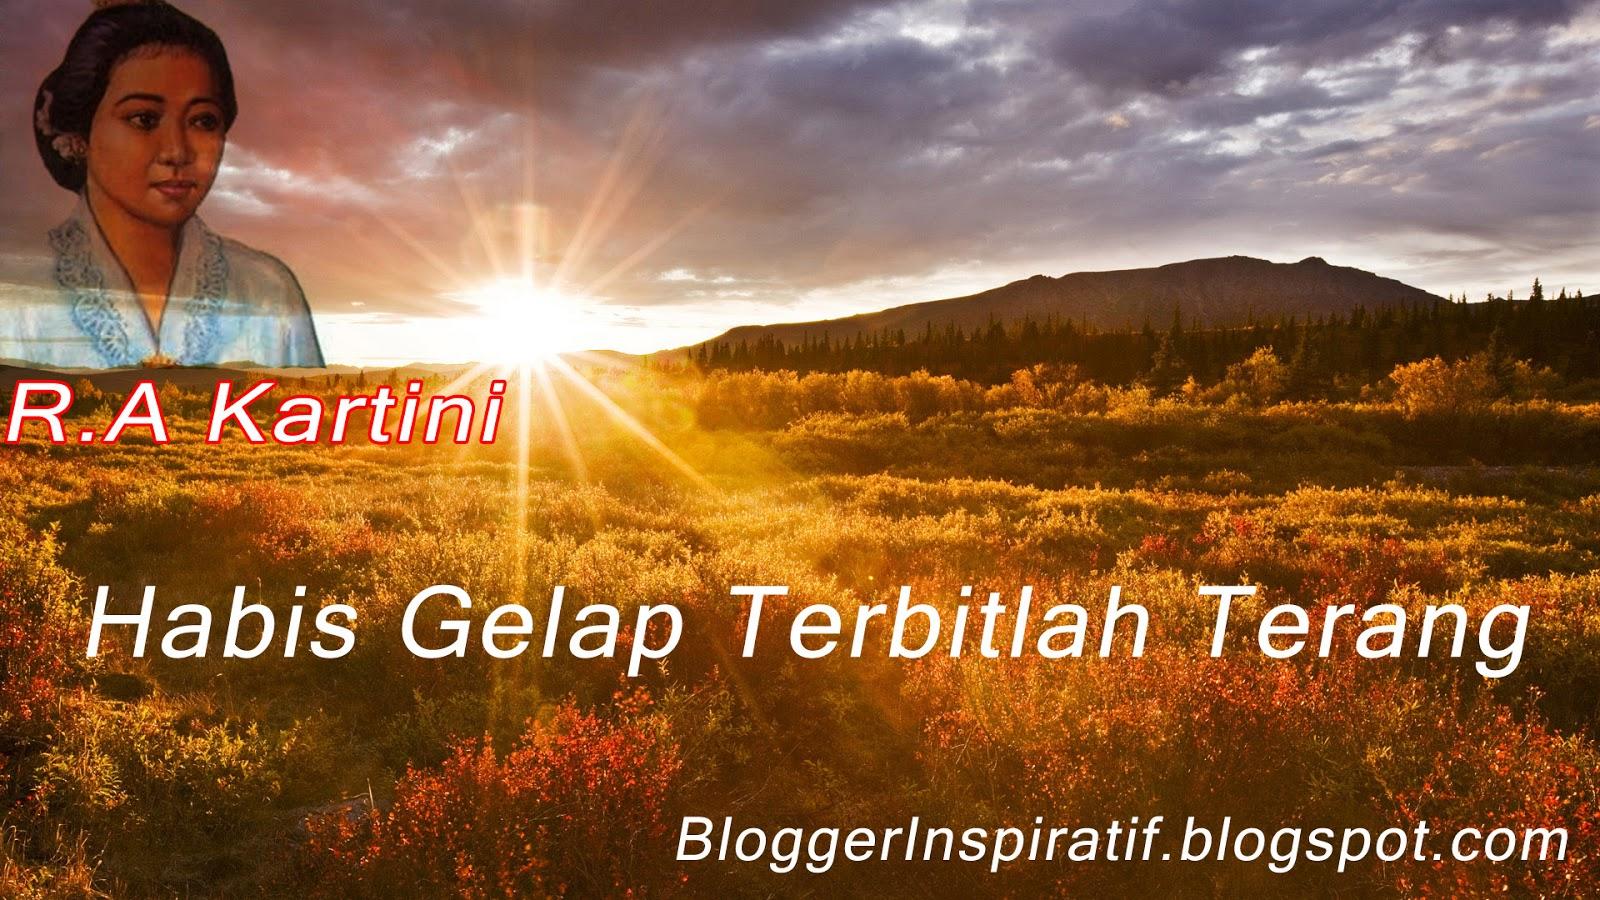 Kumpulan Puisi Hari Ibu Kartini Terbaru 2018 Blogger Inspiratif